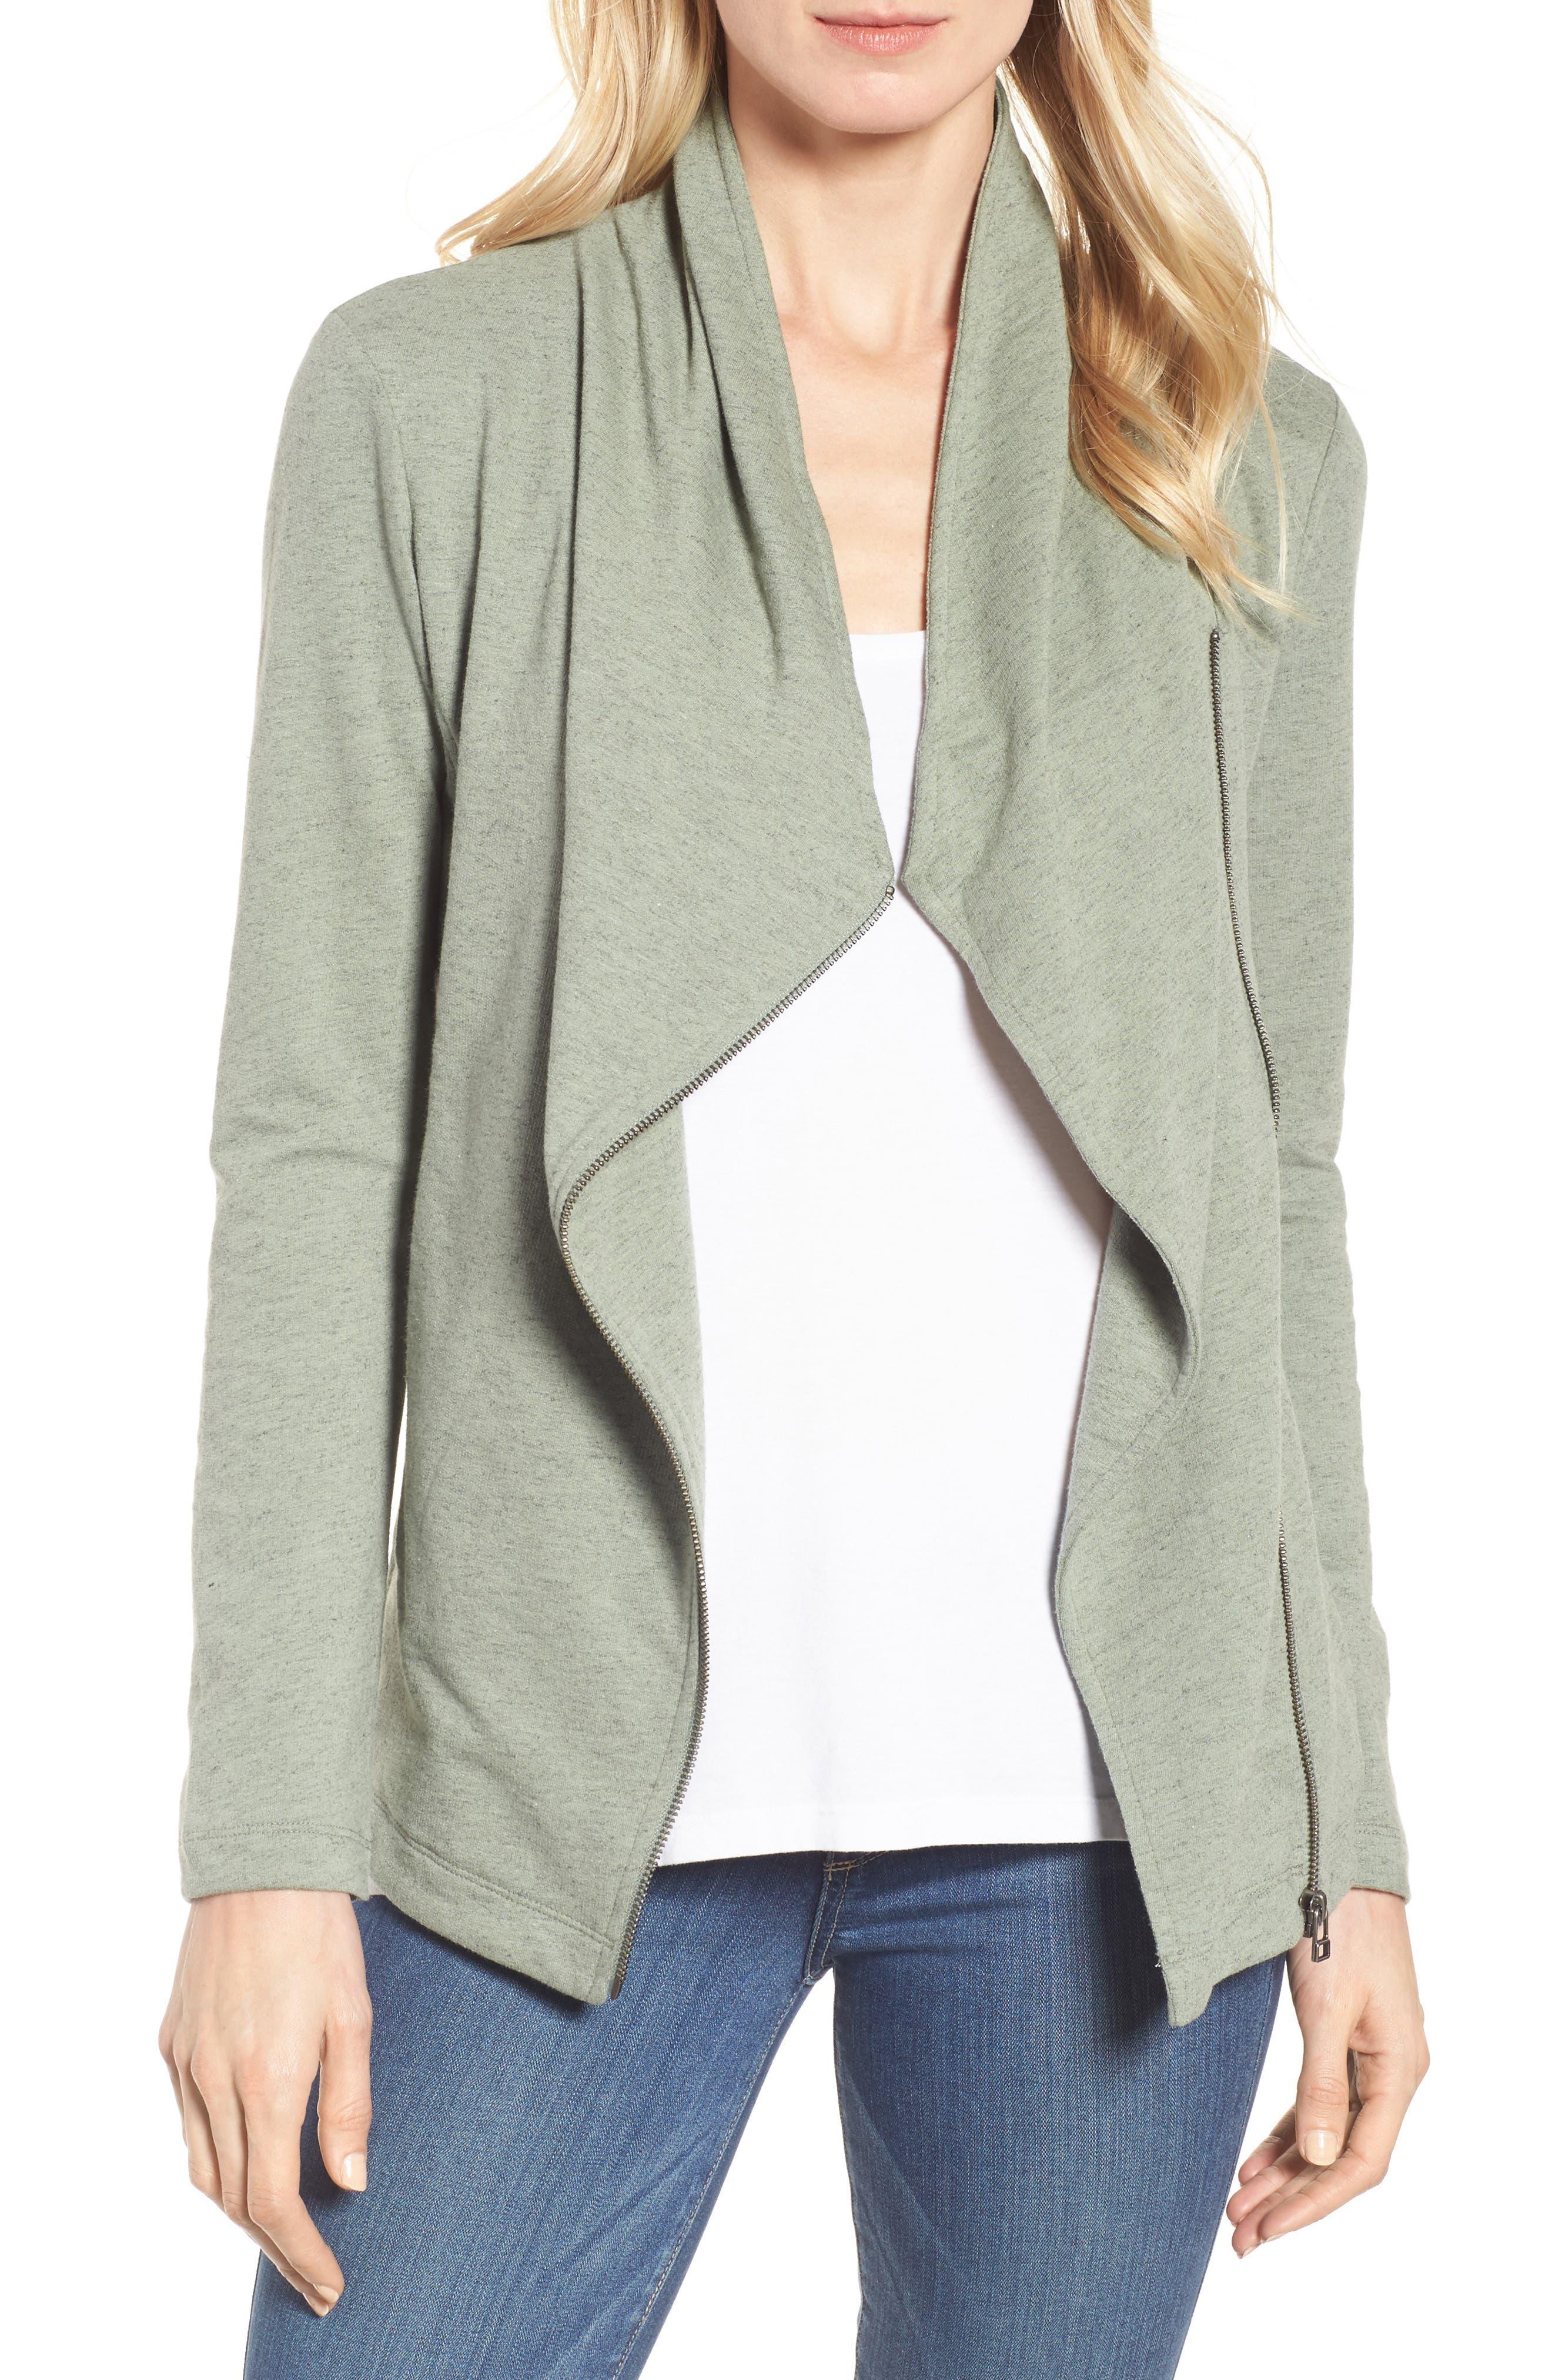 Alternate Image 1 Selected - Caslon® Stella Knit Jacket (Regular & Petite)